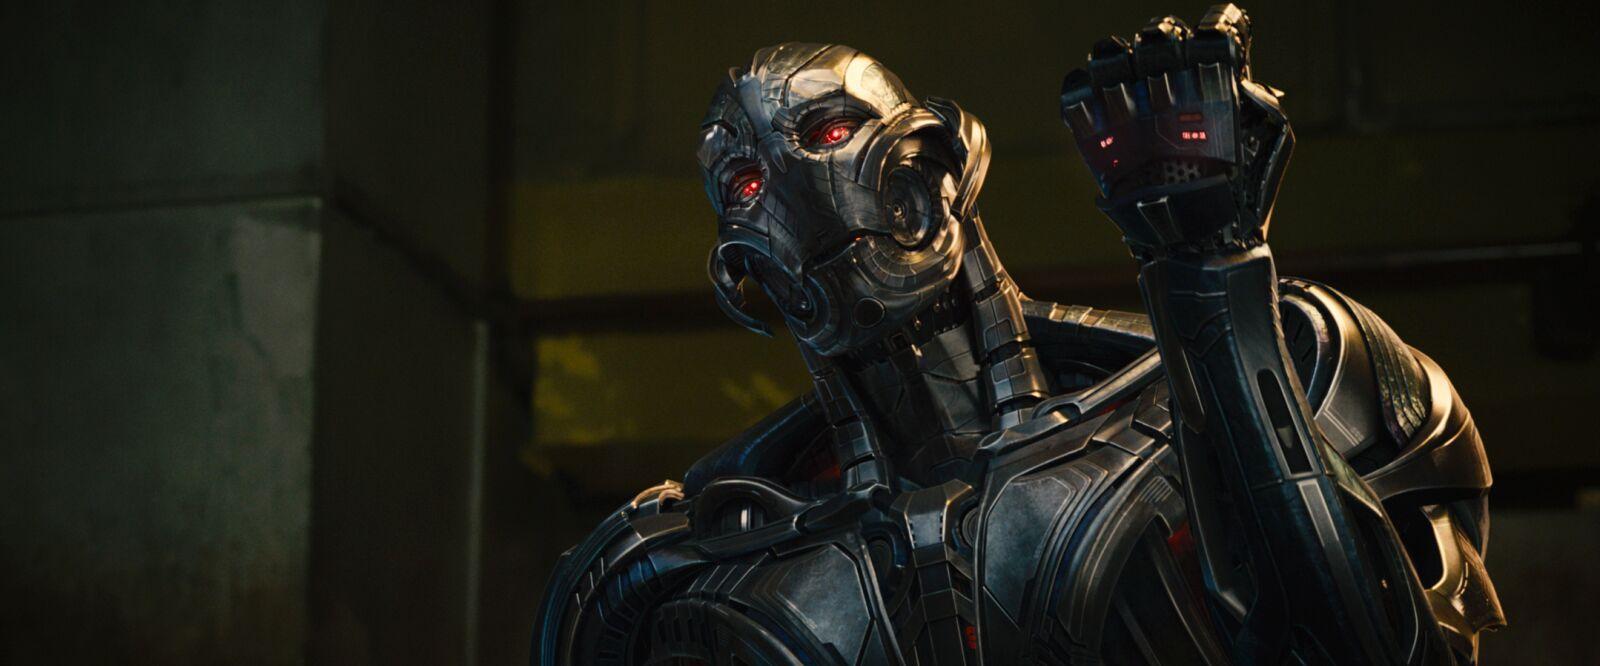 Marvel's Runaways season 3: Ultron connection established